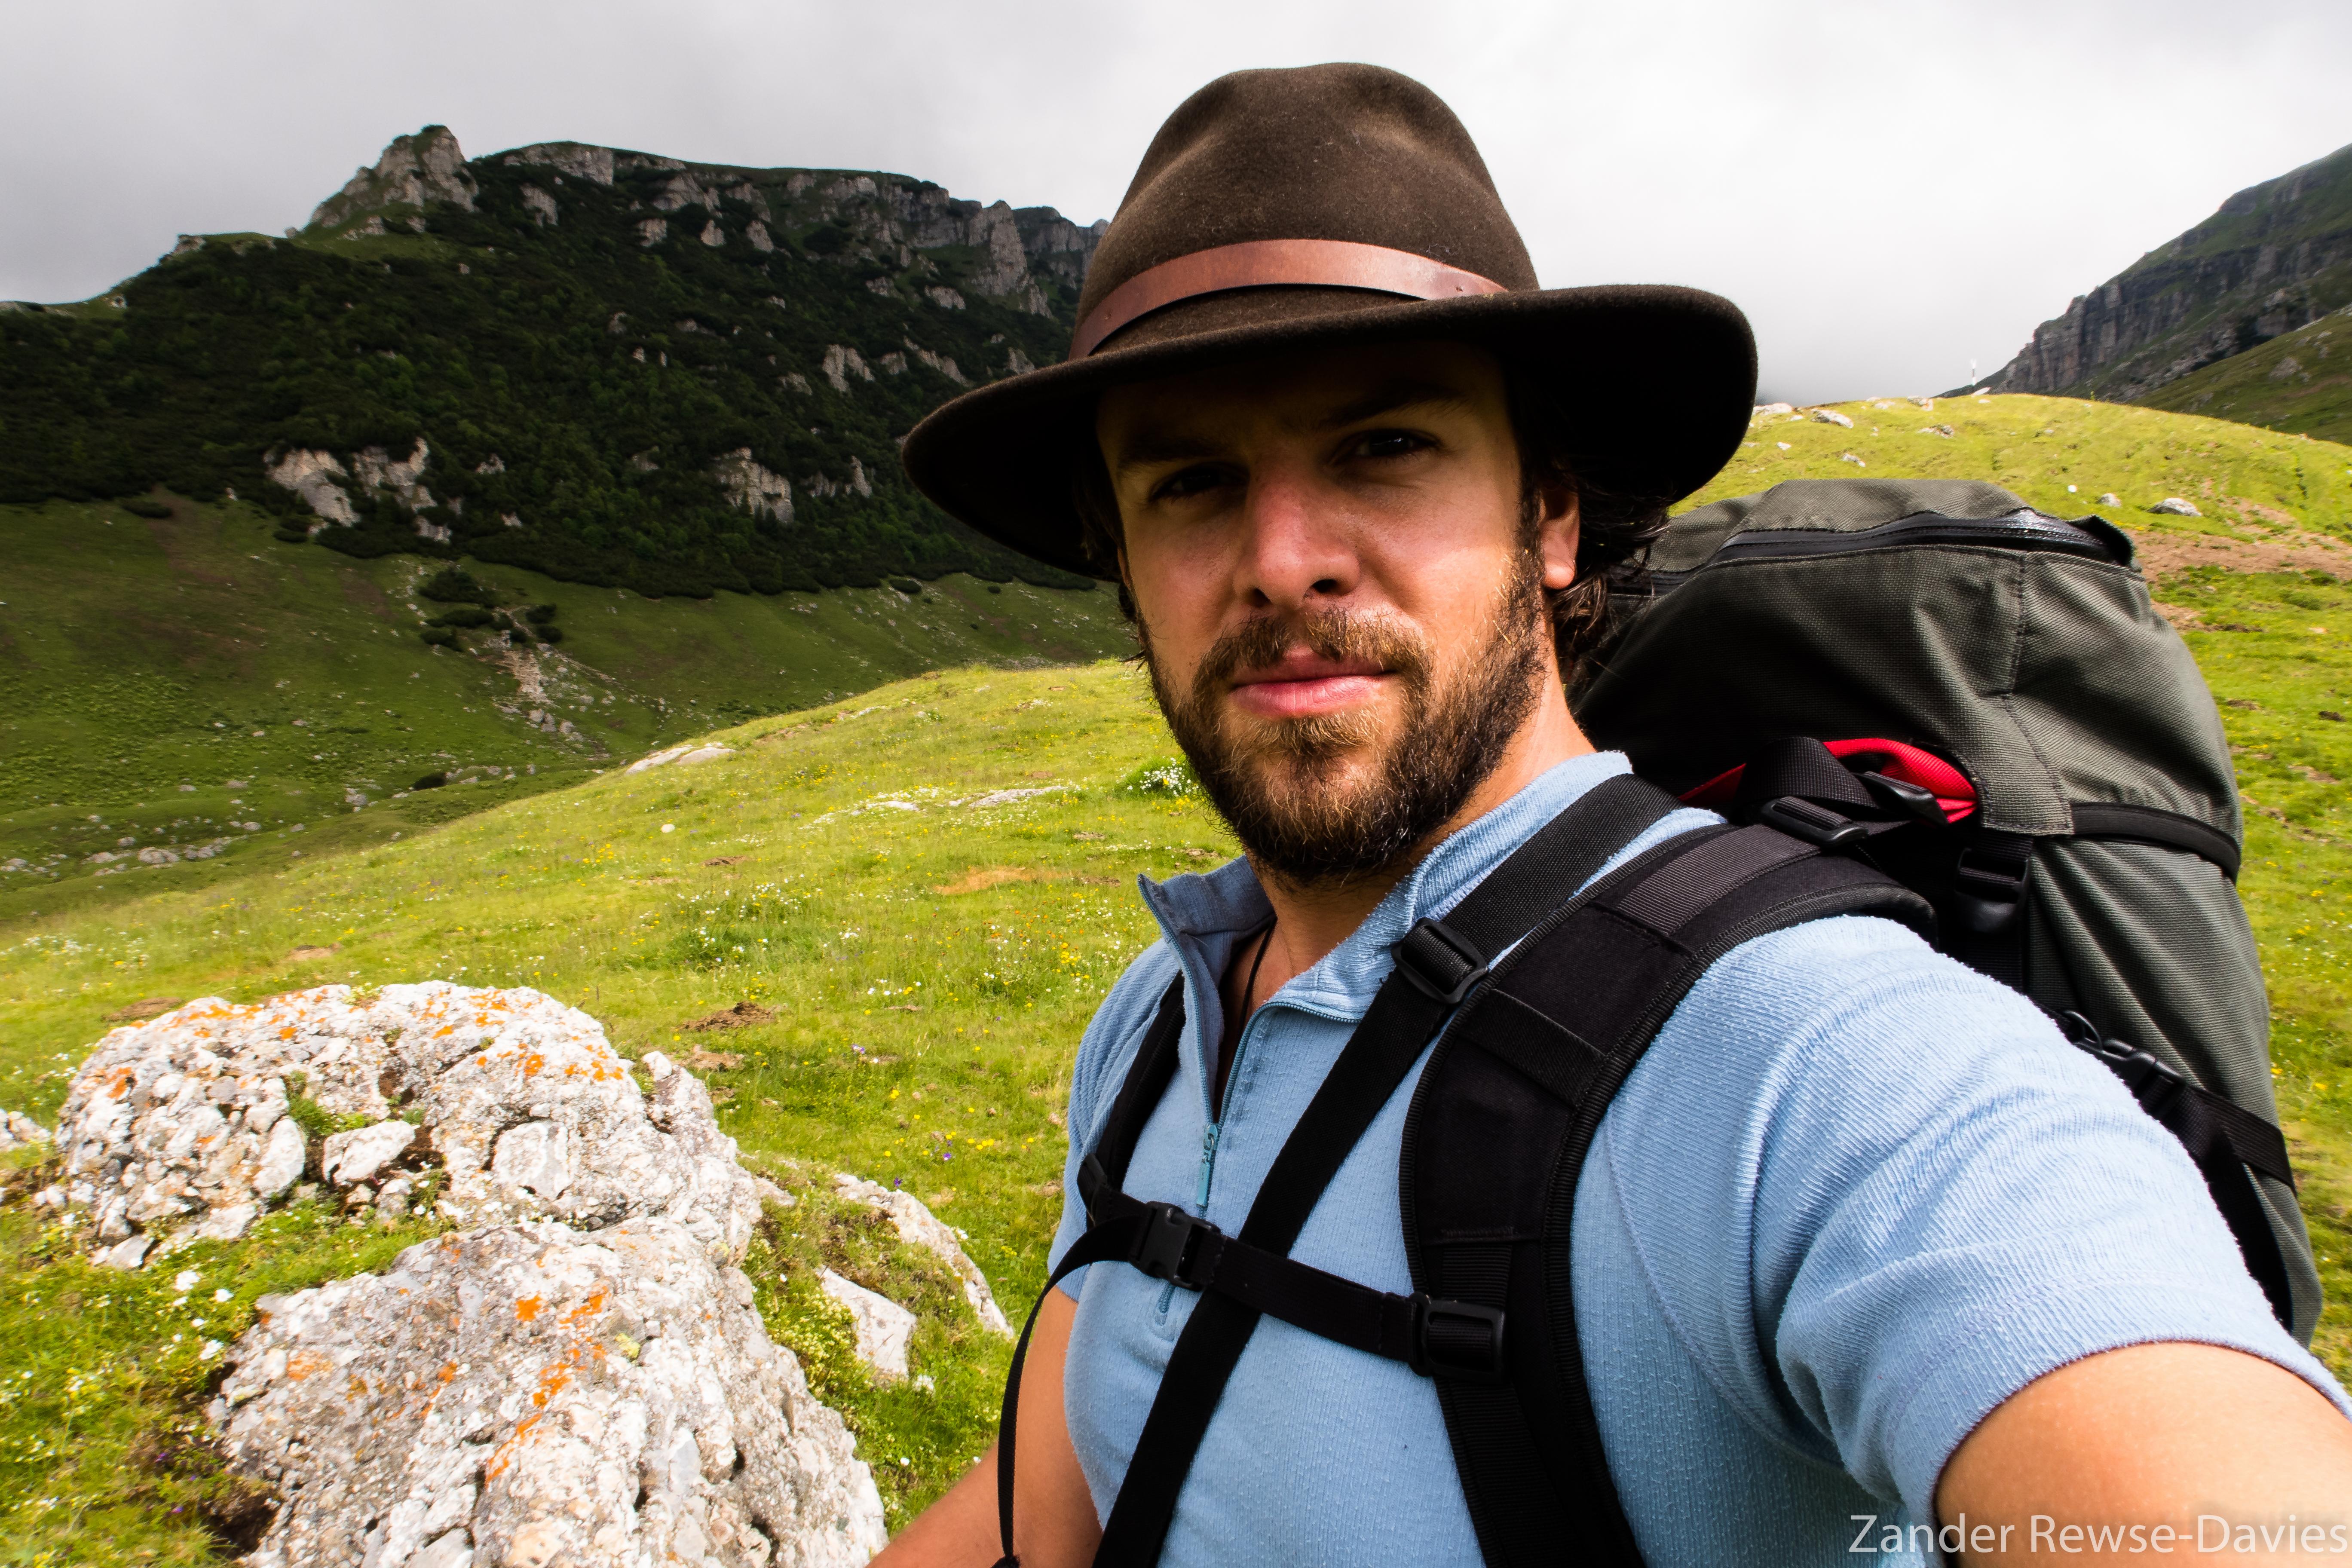 Zander hiking in Bucegi, Romania